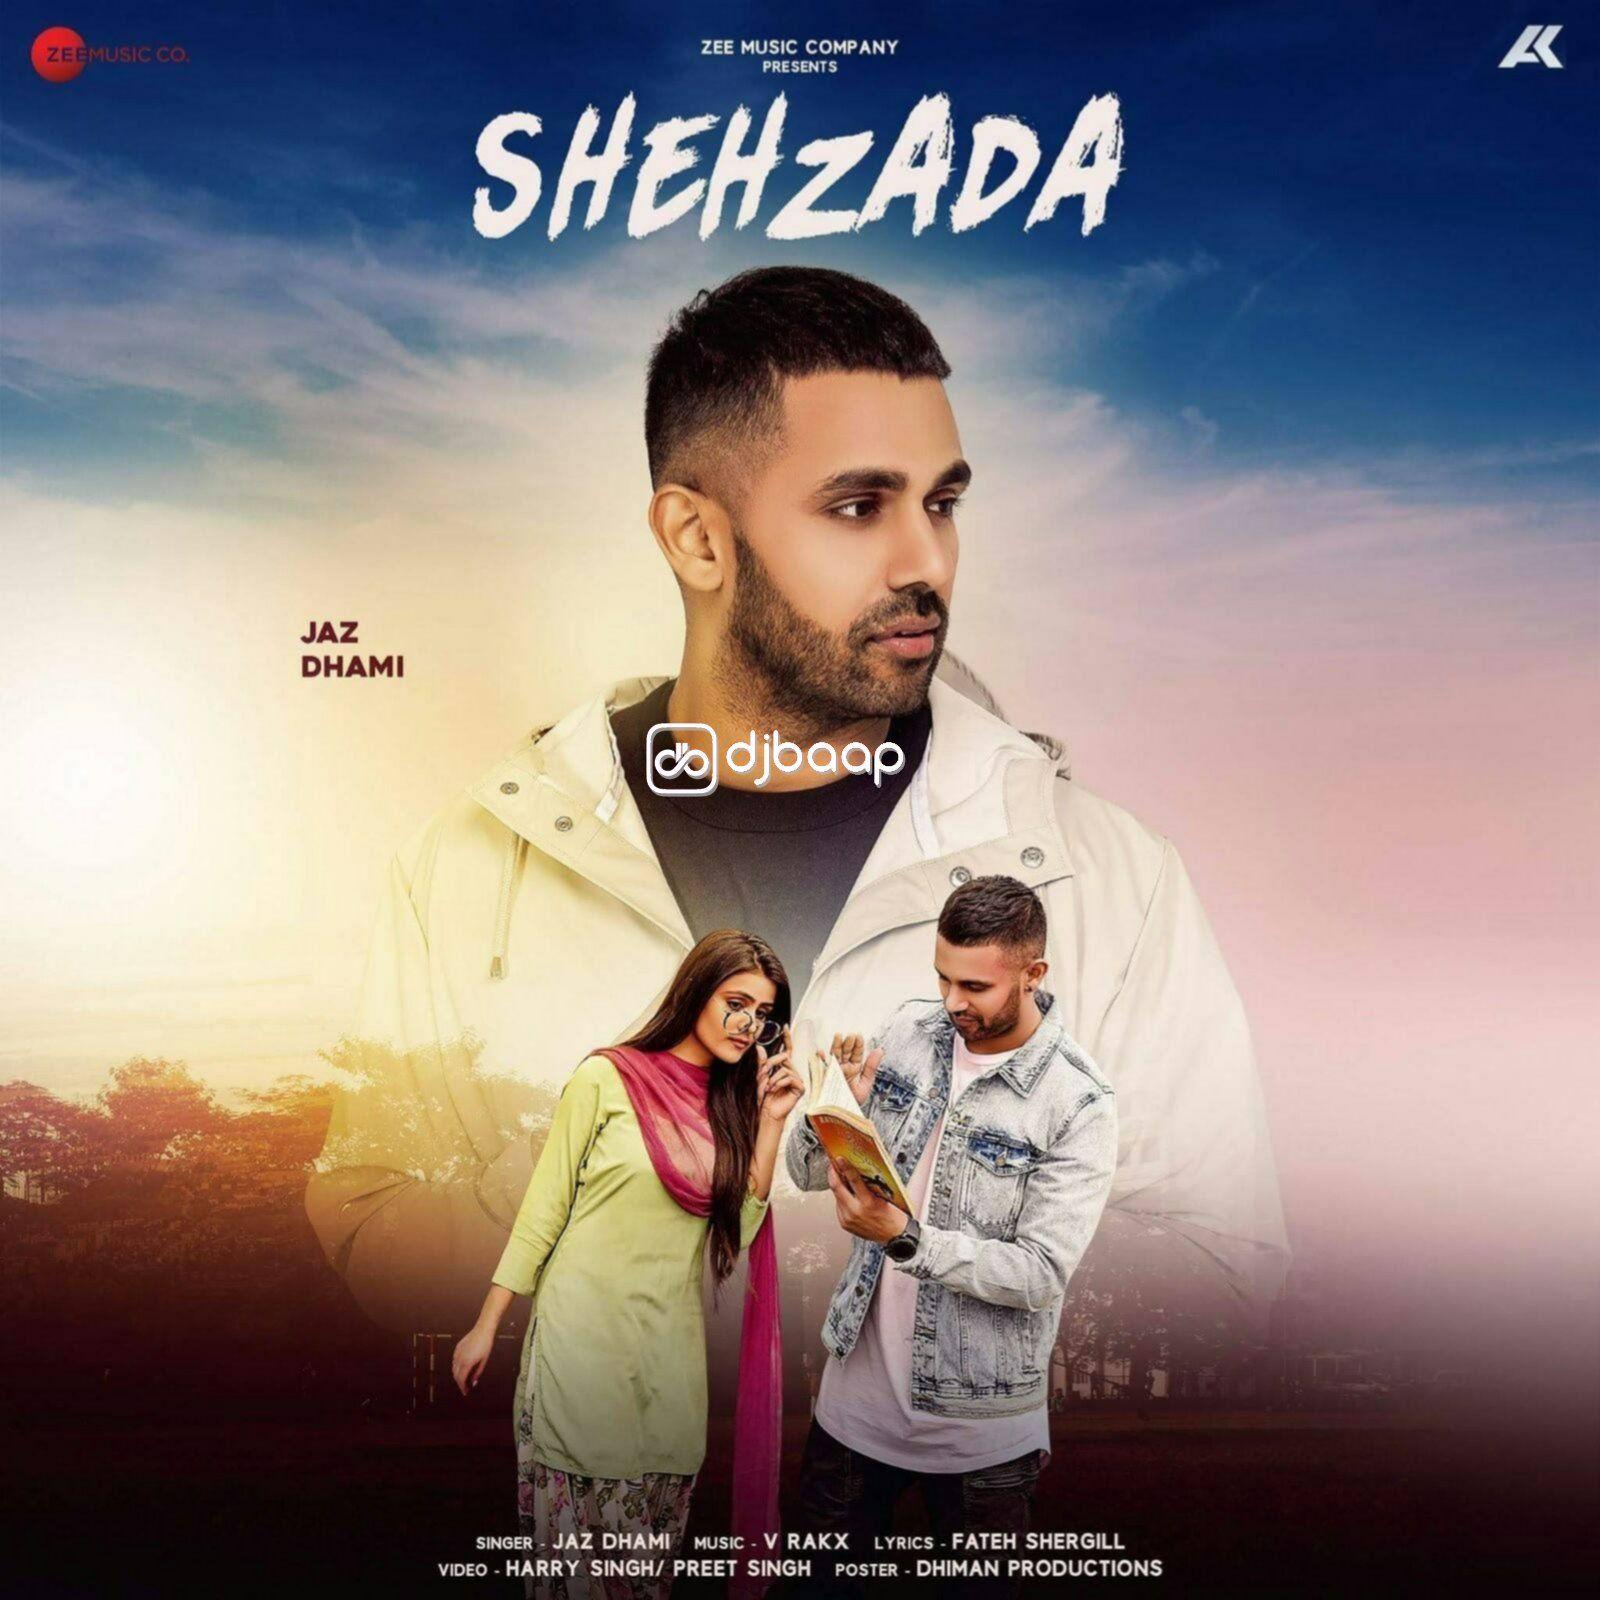 Shehzada Mp3 Song Belongs New Punjabi Songs Shehzada By Jaz Dhami Shehzada Available To Free Download On Djbaap Shehzada R Free Movie Downloads Songs Mp3 Song